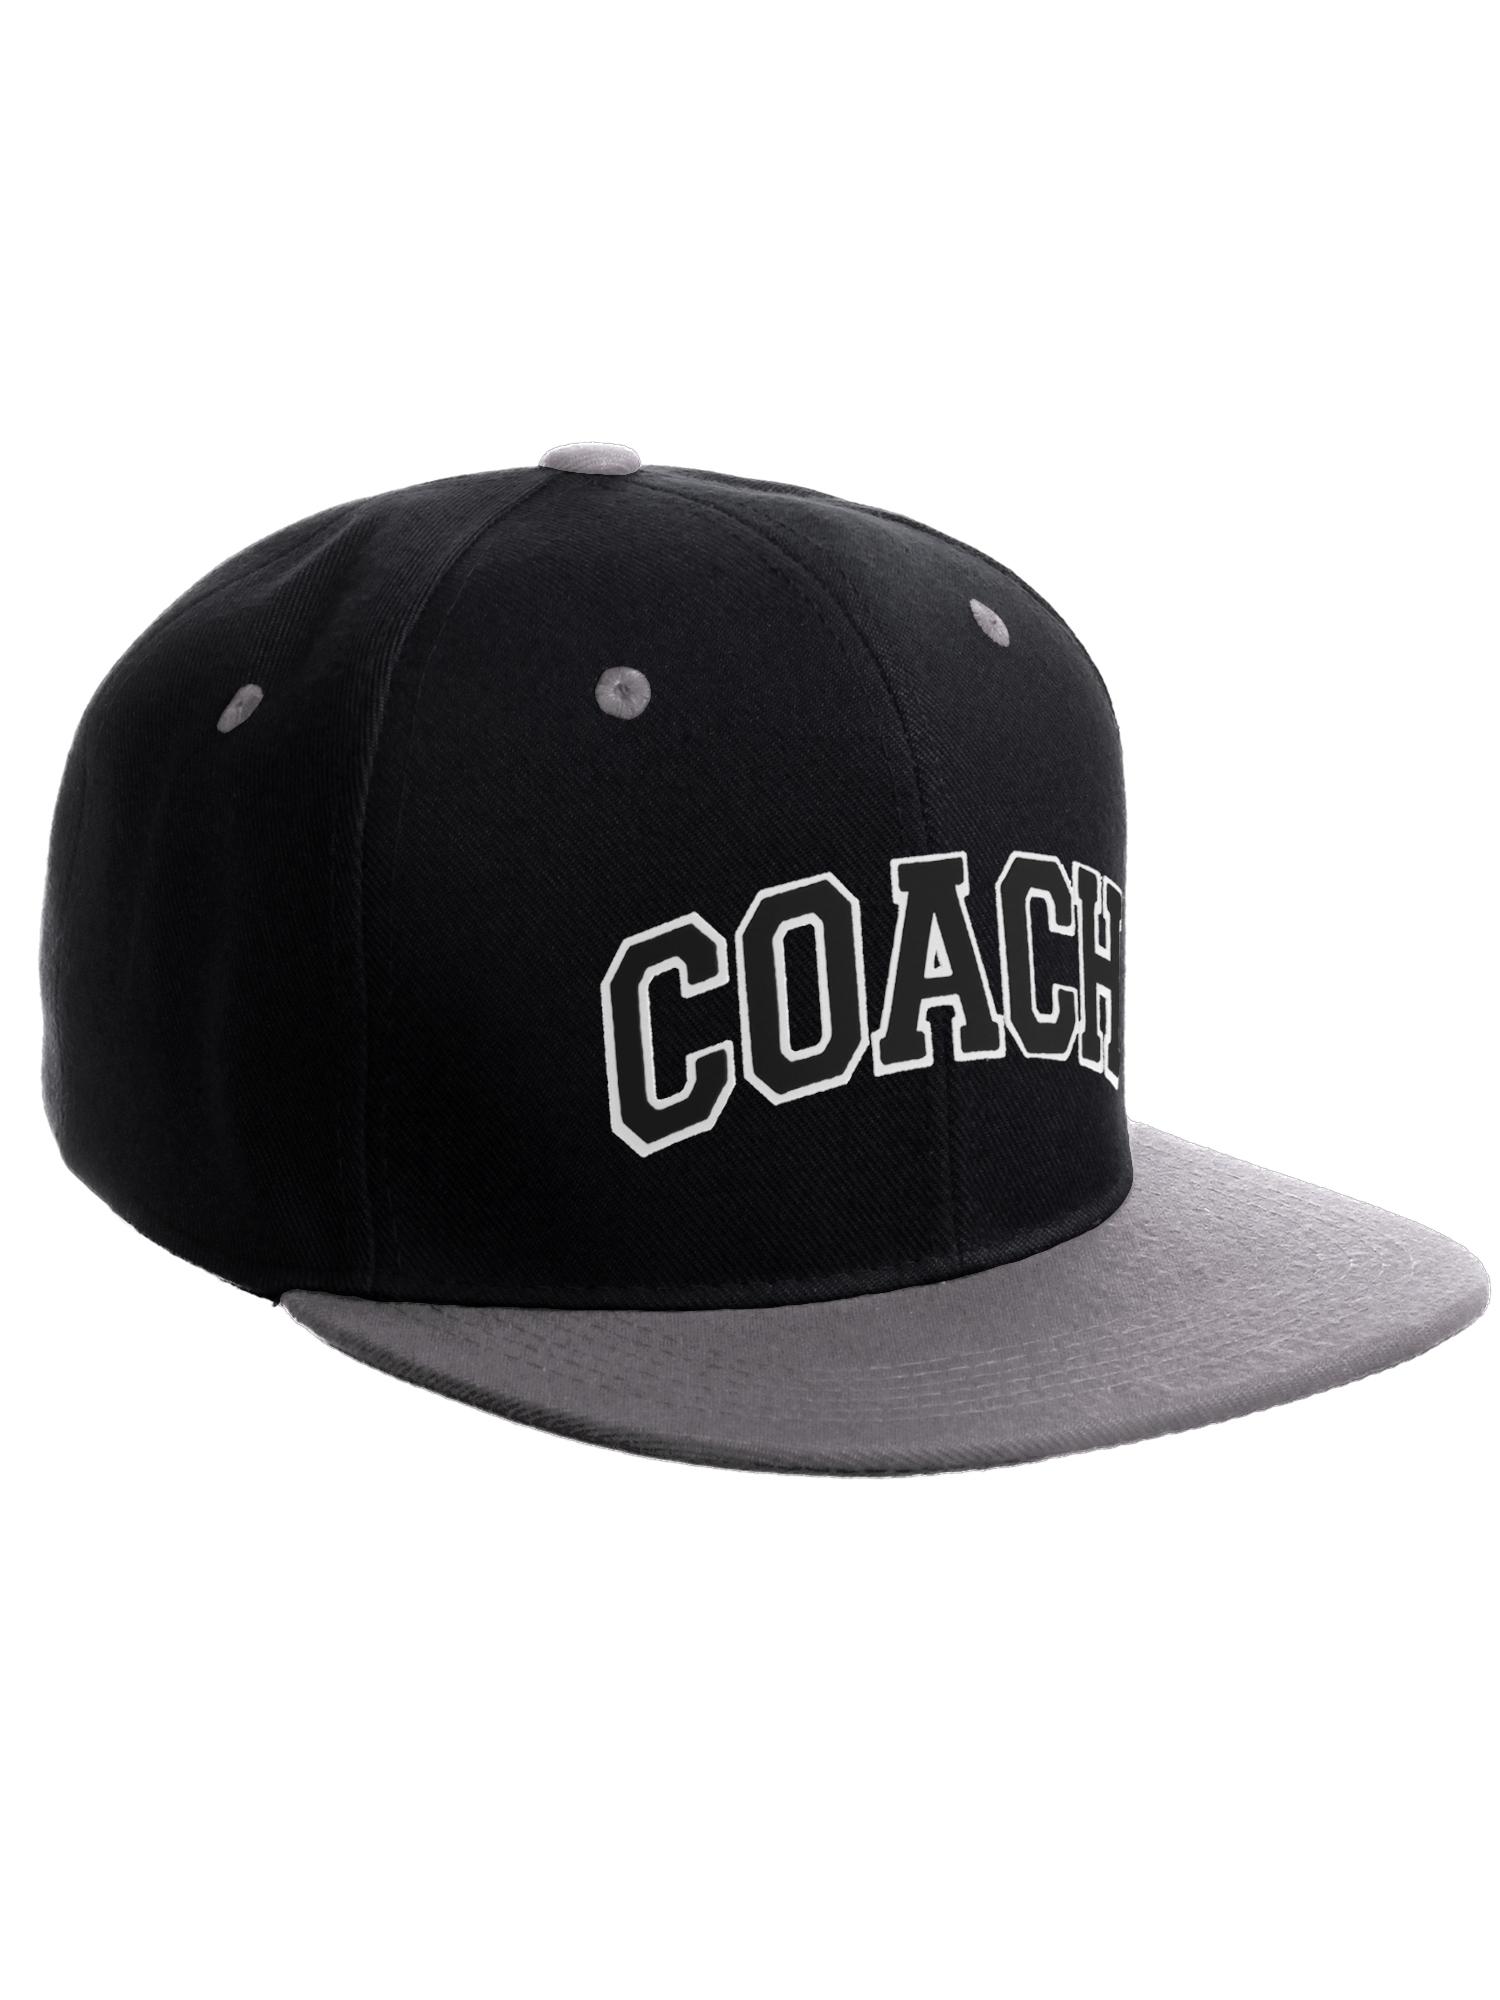 Sport Team Coach Snapback Custom 3D Layer Coach Arch Letters Flat Bill Hat  Cap - Walmart.com 03f7a8d01657